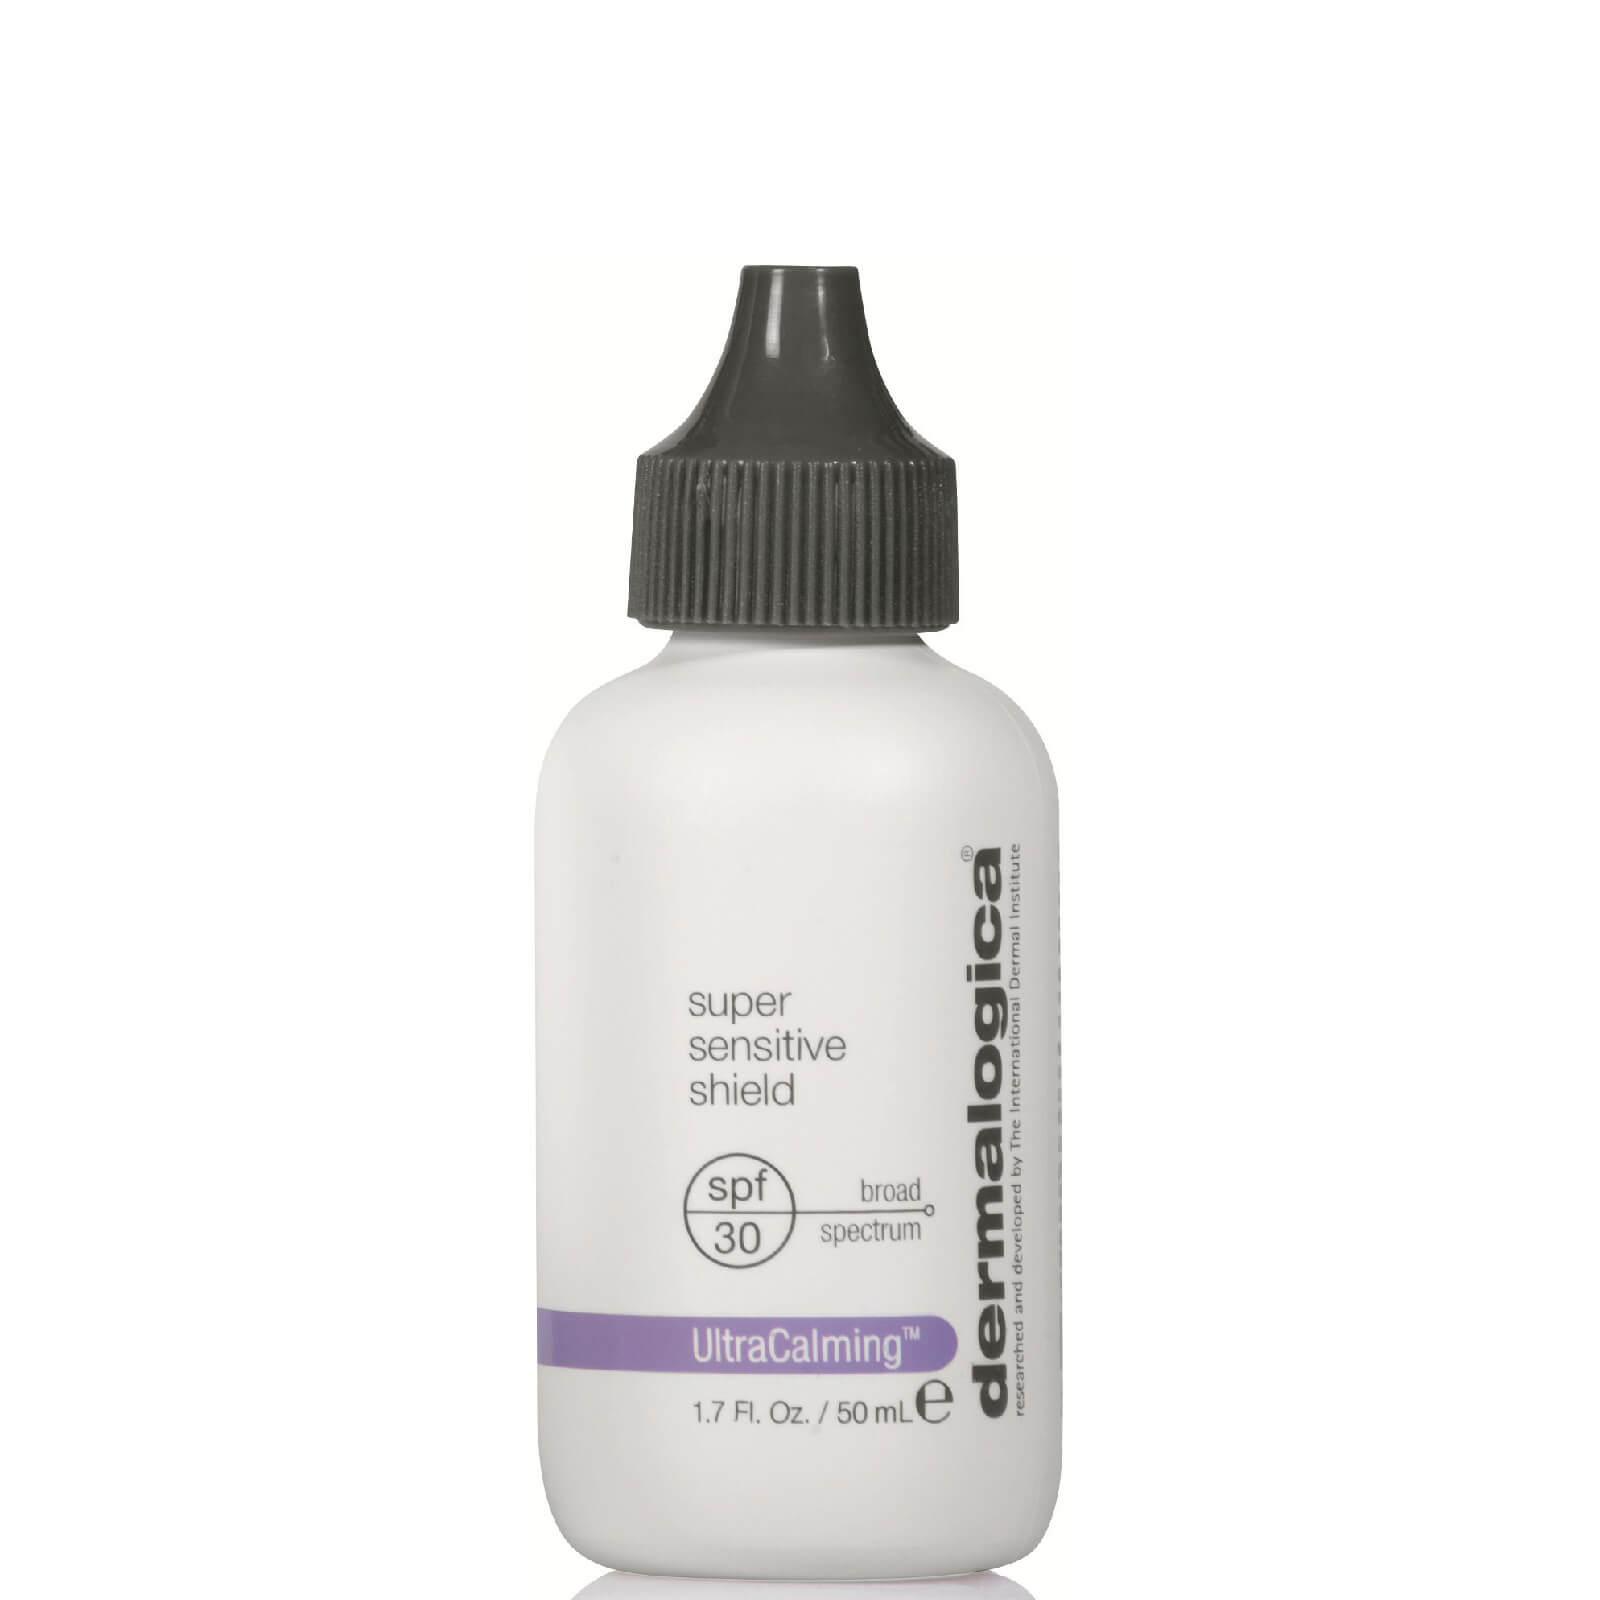 Dermalogica Crème de protection  Super Sensitive  SPF30 de Dermatologica (50 ml)